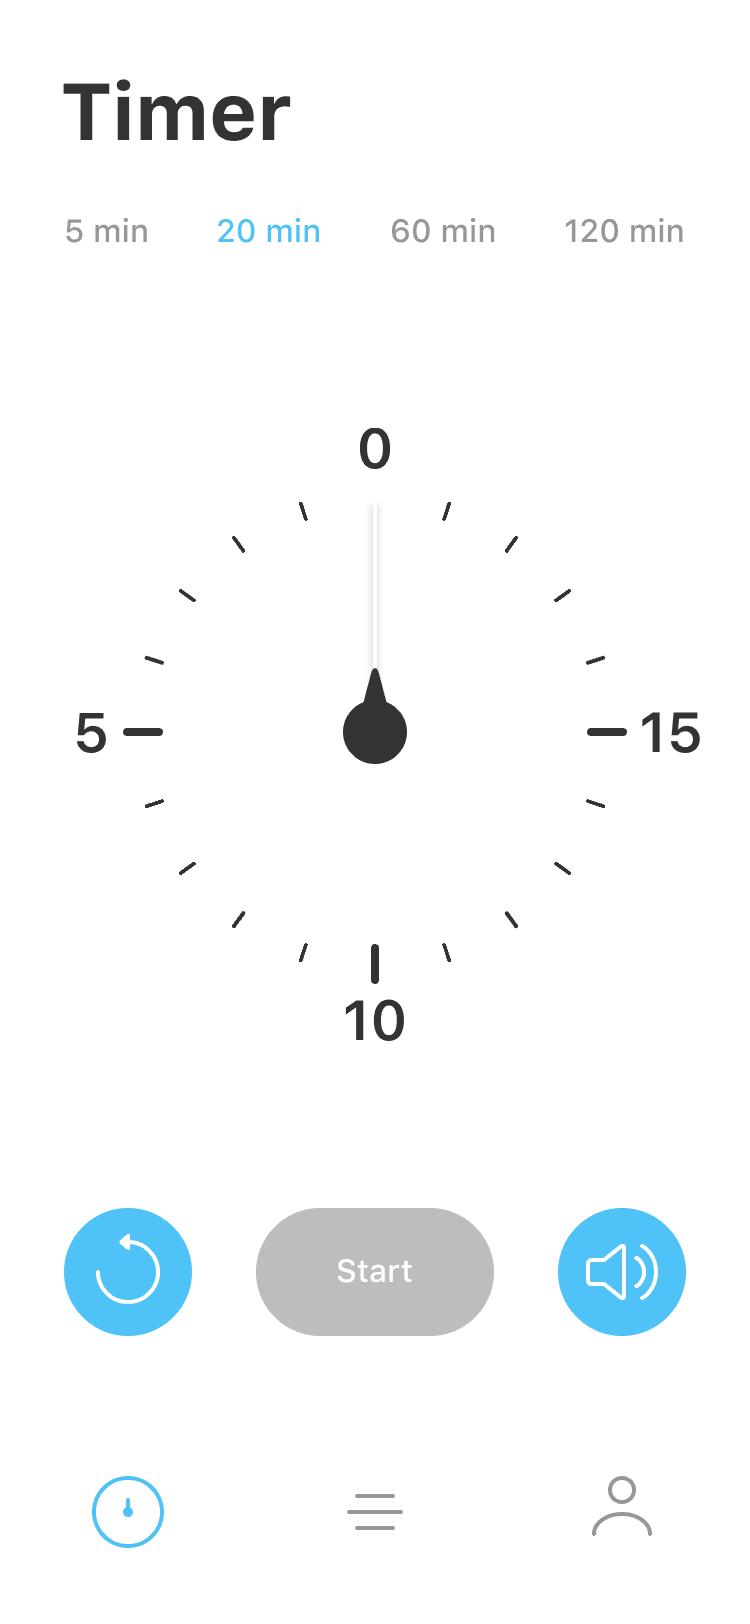 Timer 20min